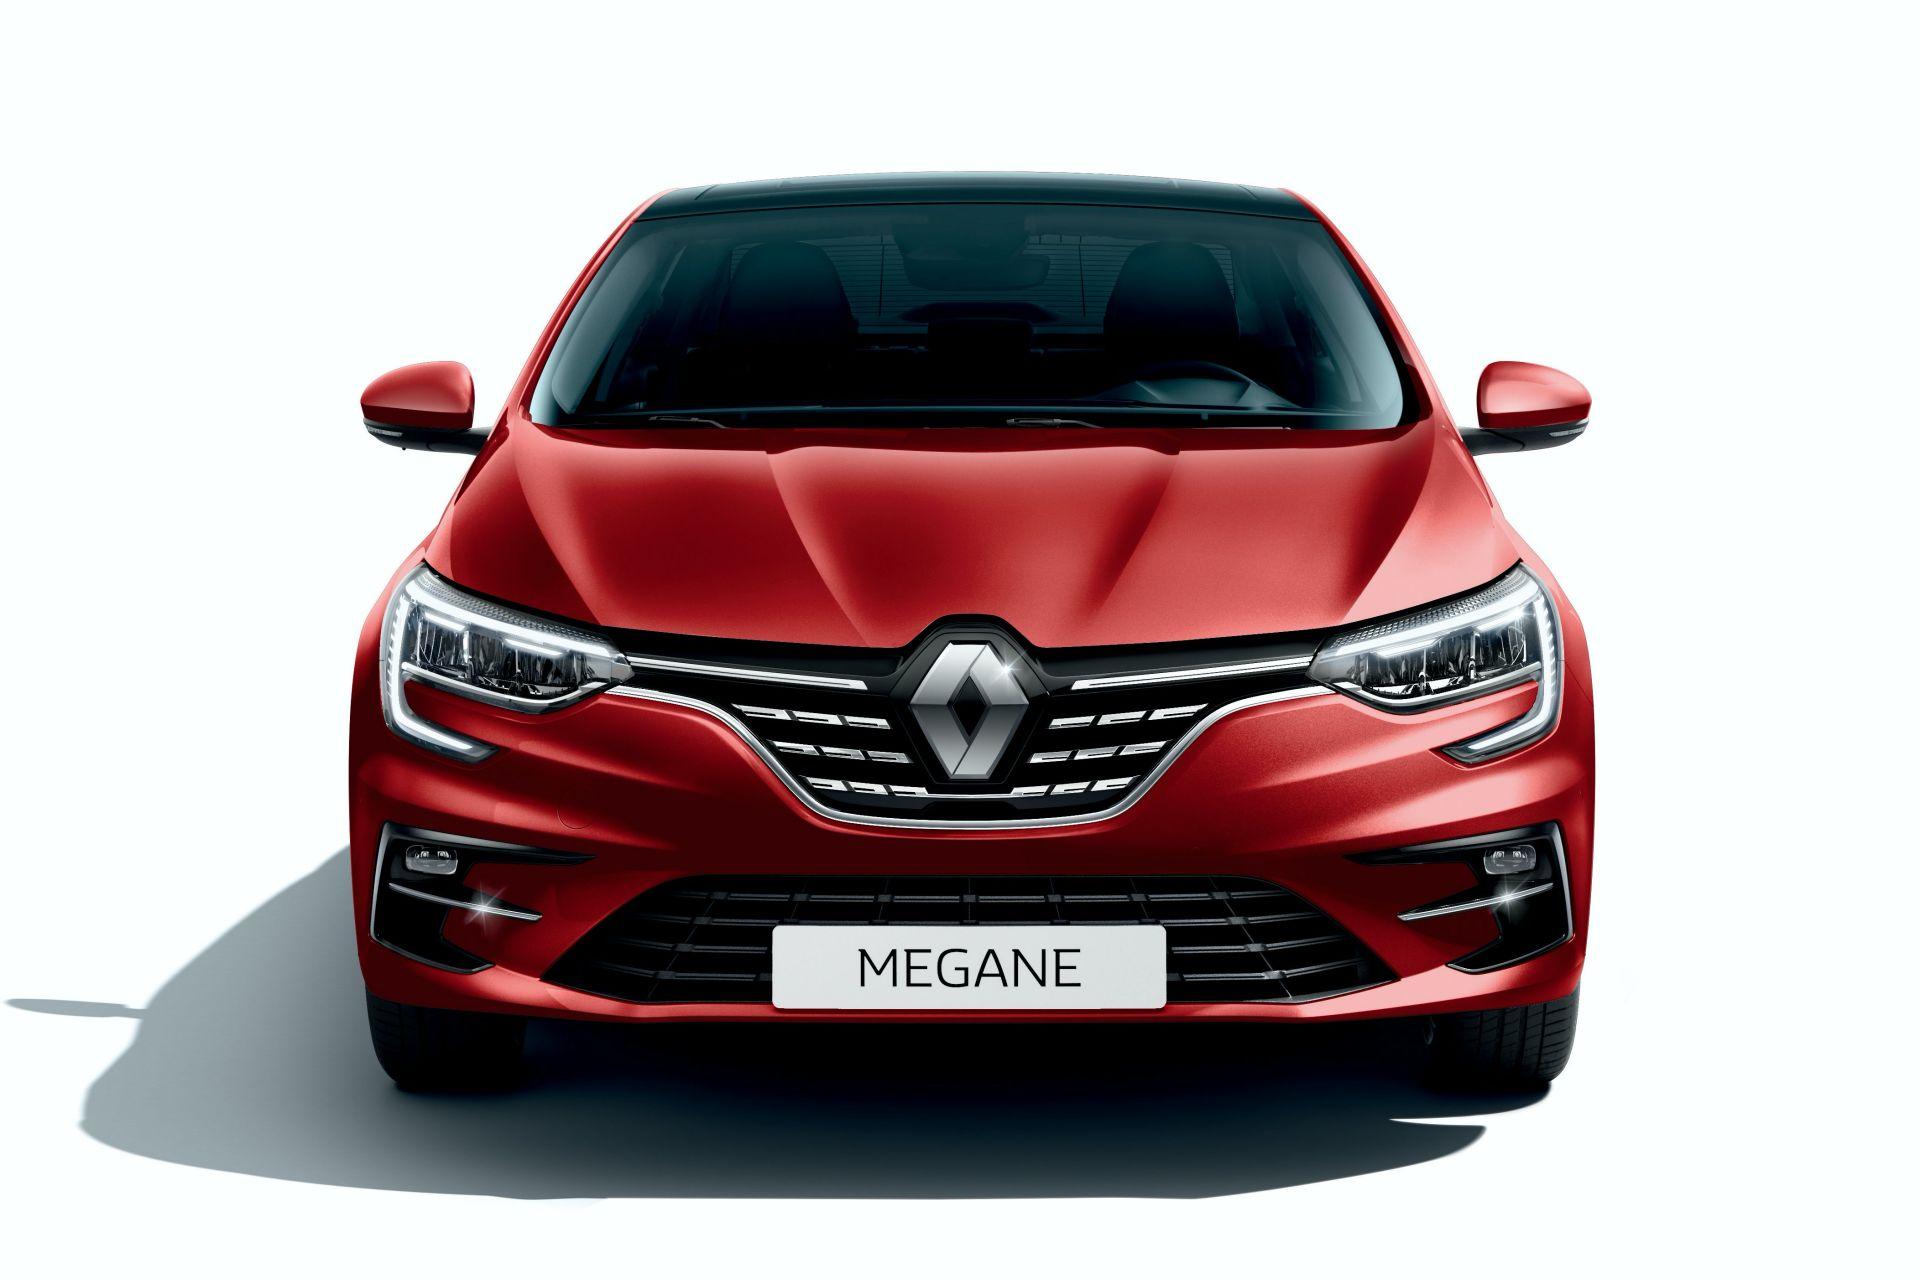 2021-Renault-Megane-Sedan-facelift-12